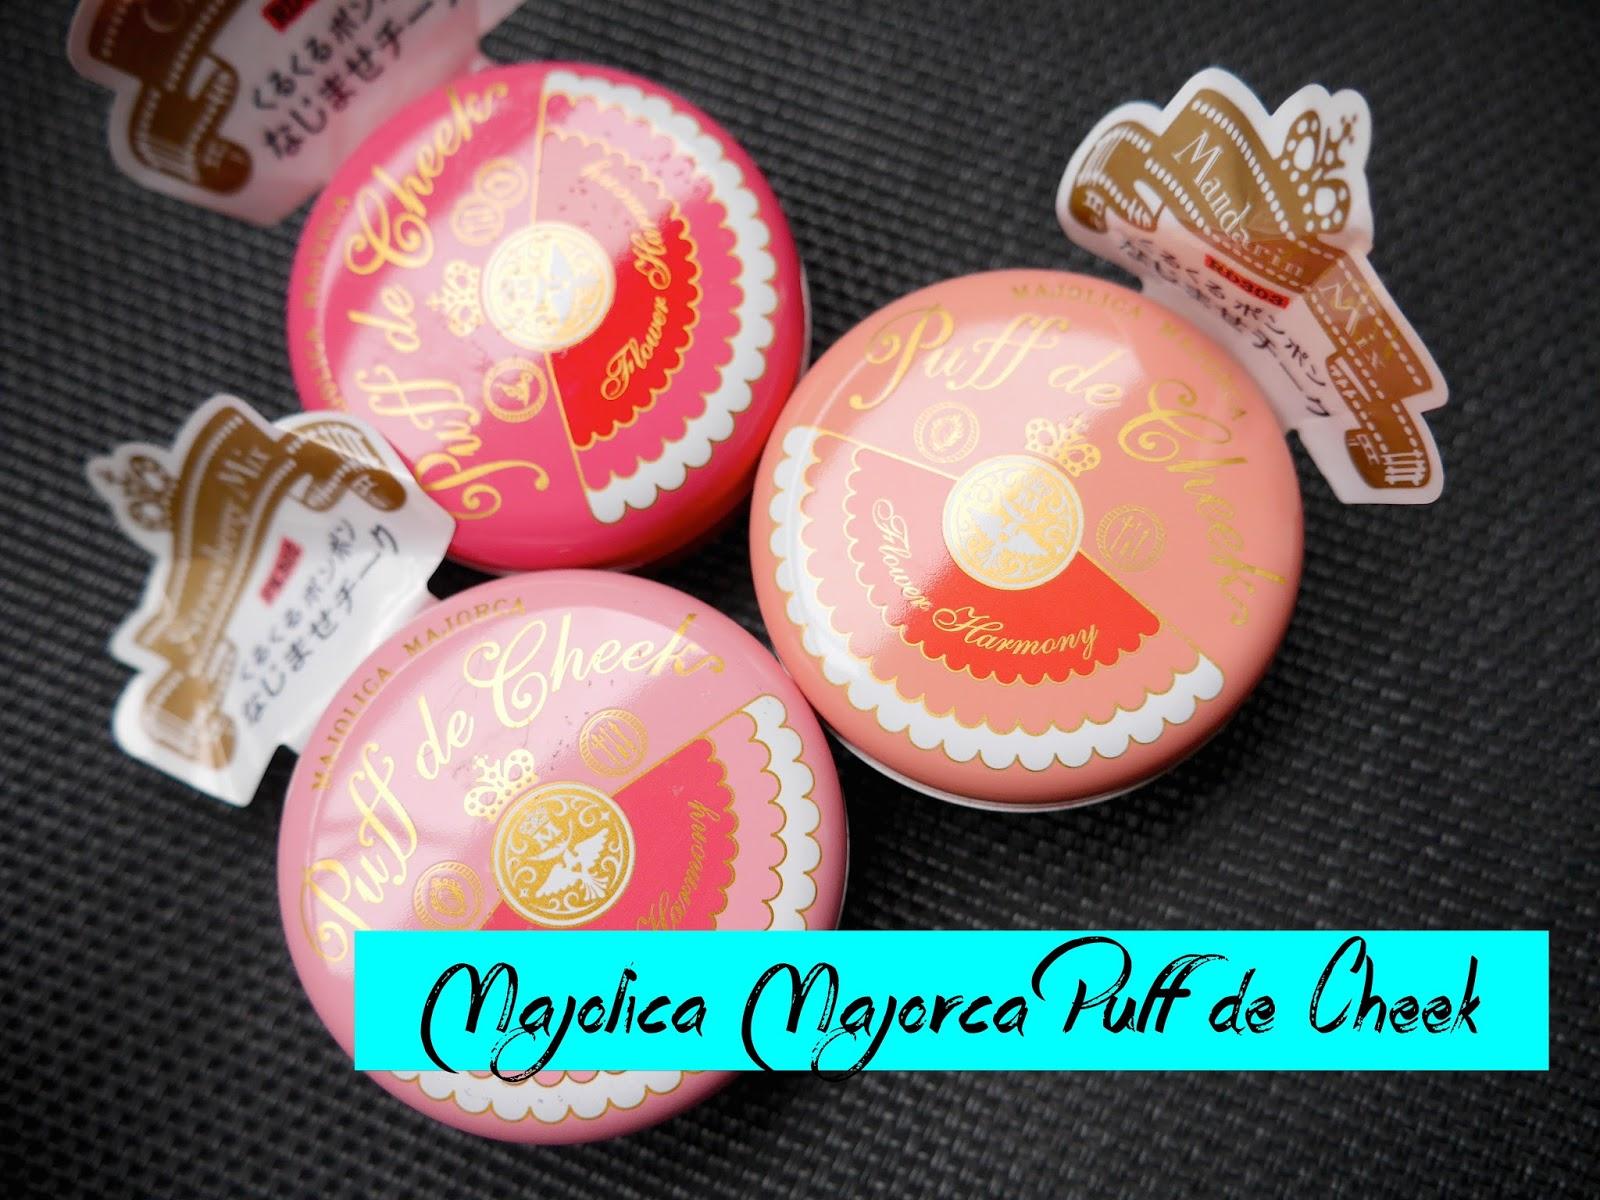 Majolica Majora Puff de Cheek cherry mix strawberry mix mandarin mix review swatch